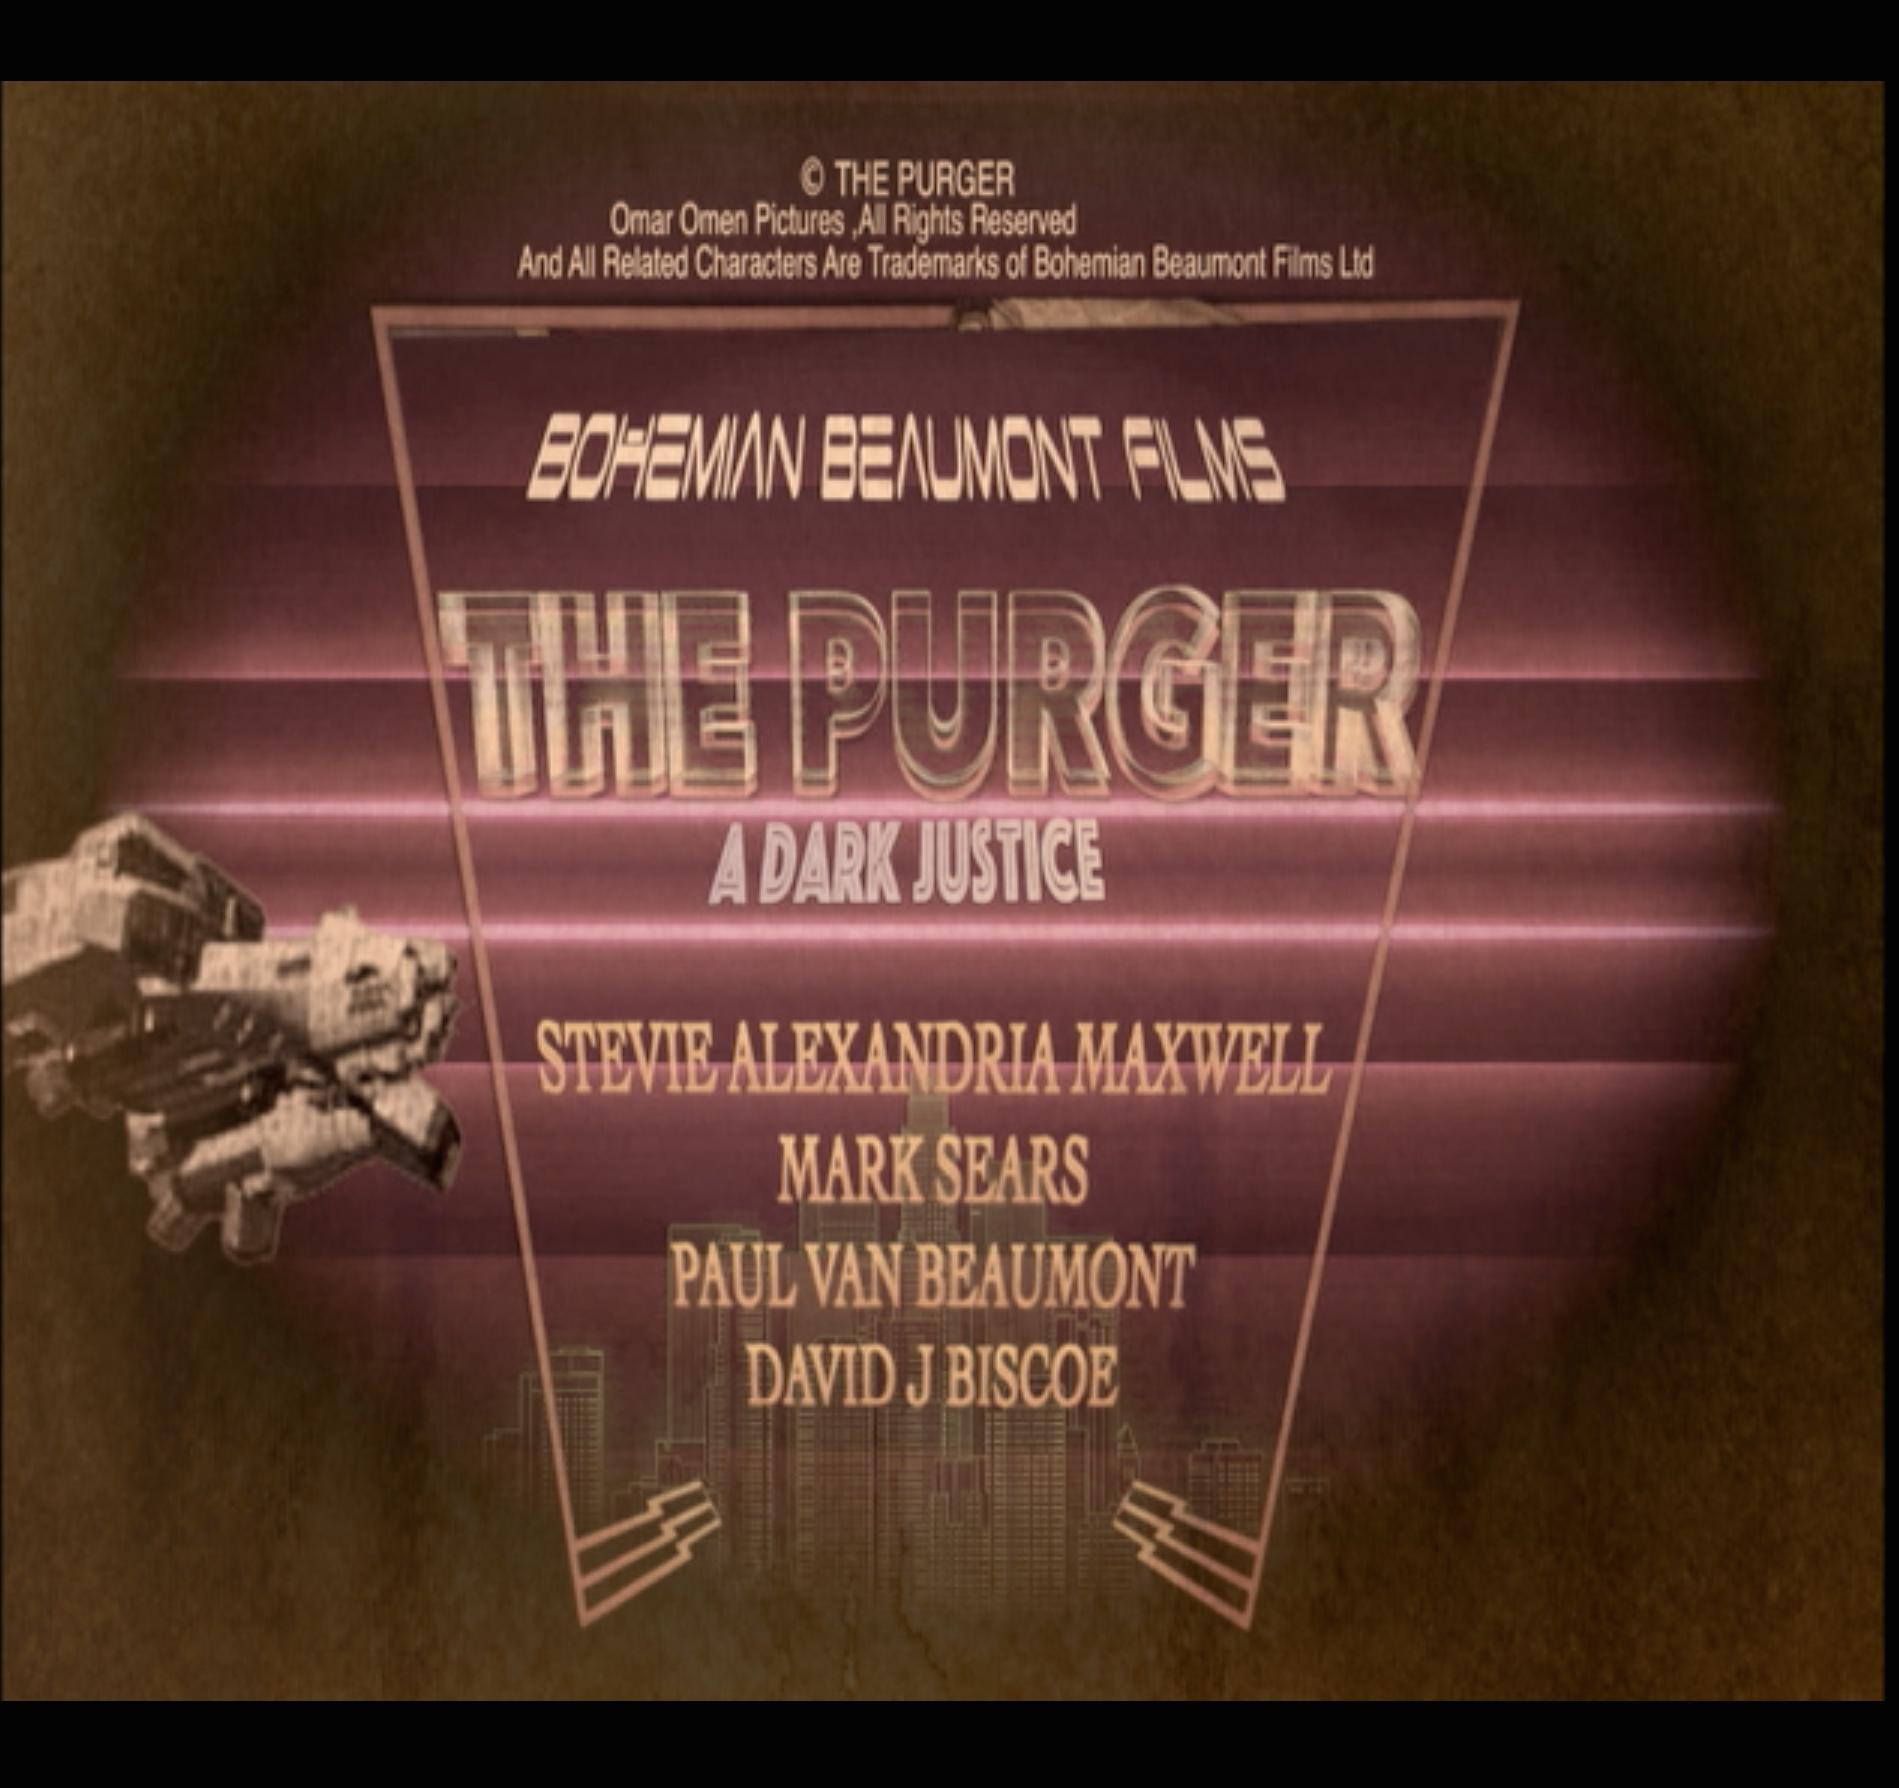 Paul Van Beaumont, David J Biscoe, Stevie Alexandria Maxwell, and Mark Sears in The Purger (2020)